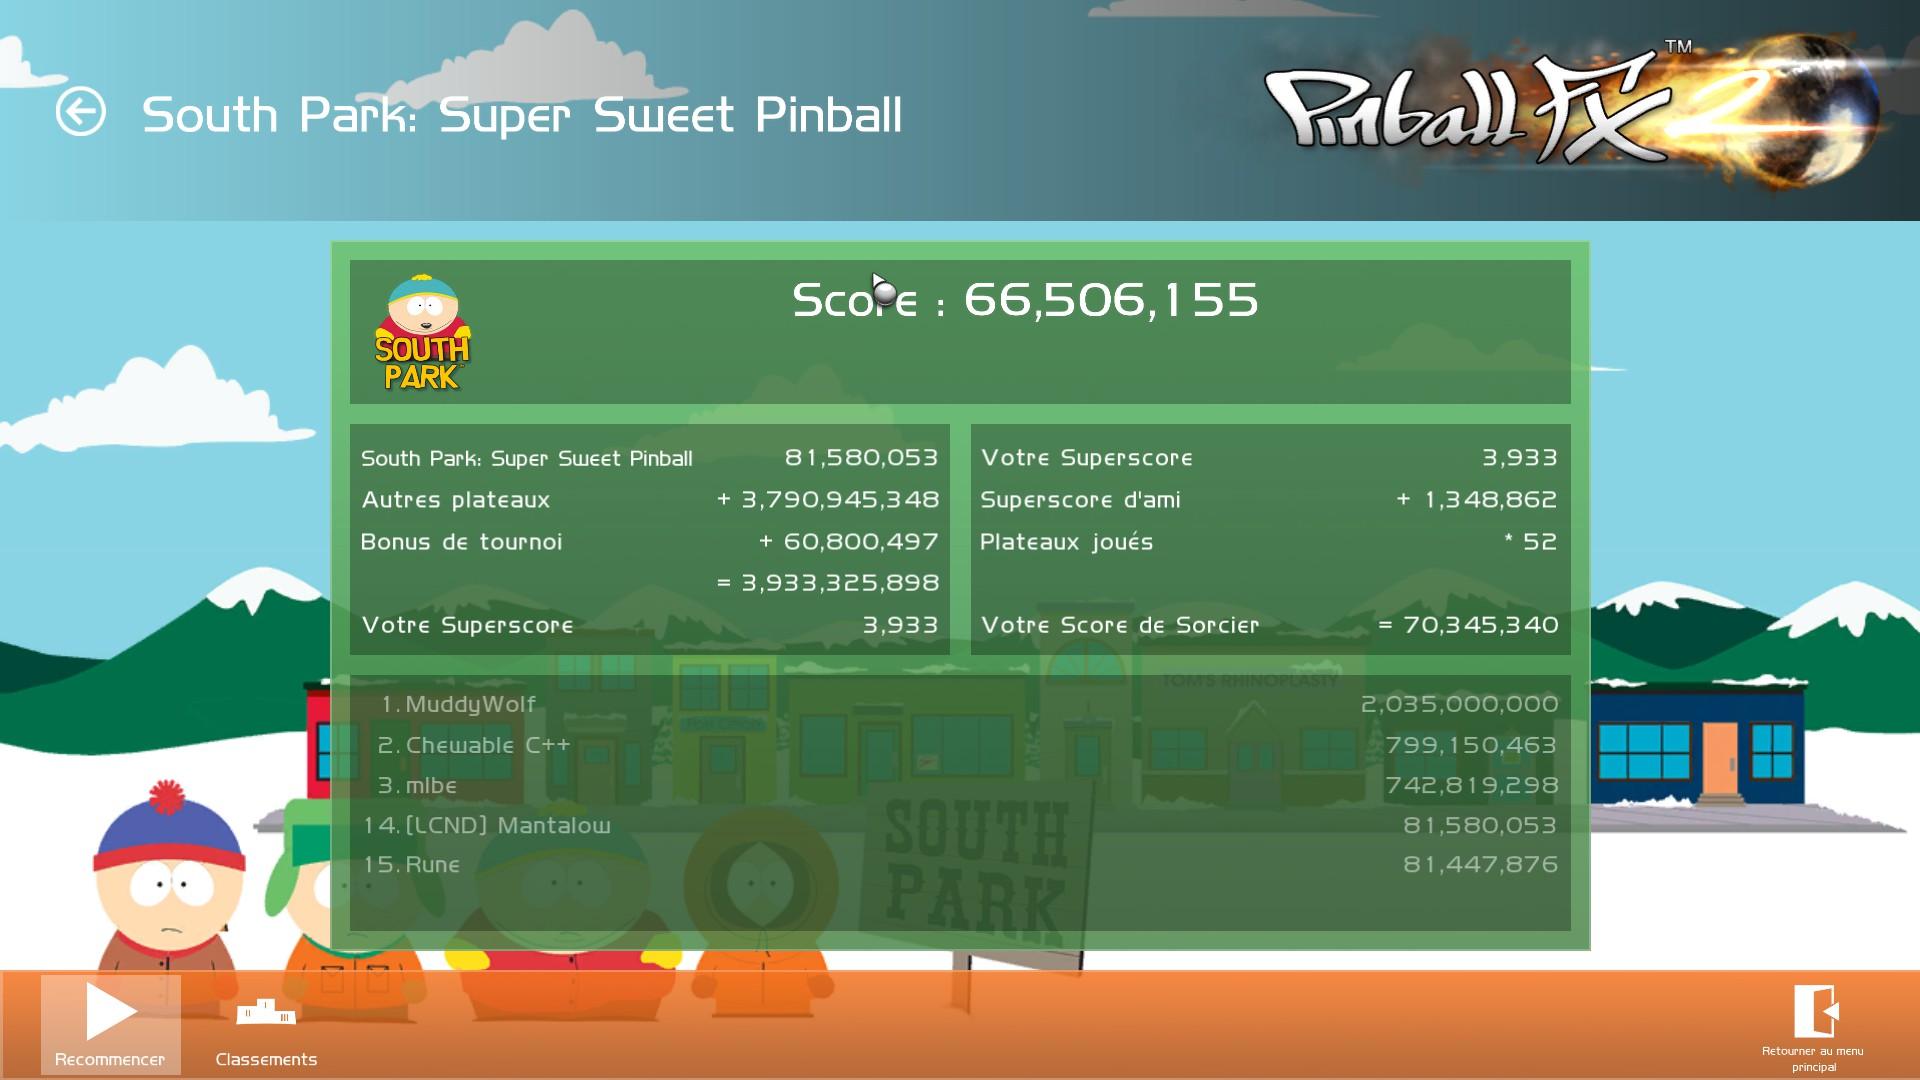 Mantalow: Pinball FX 2: Super Sweet Pinball (PC) 81,580,053 points on 2015-07-22 02:04:32